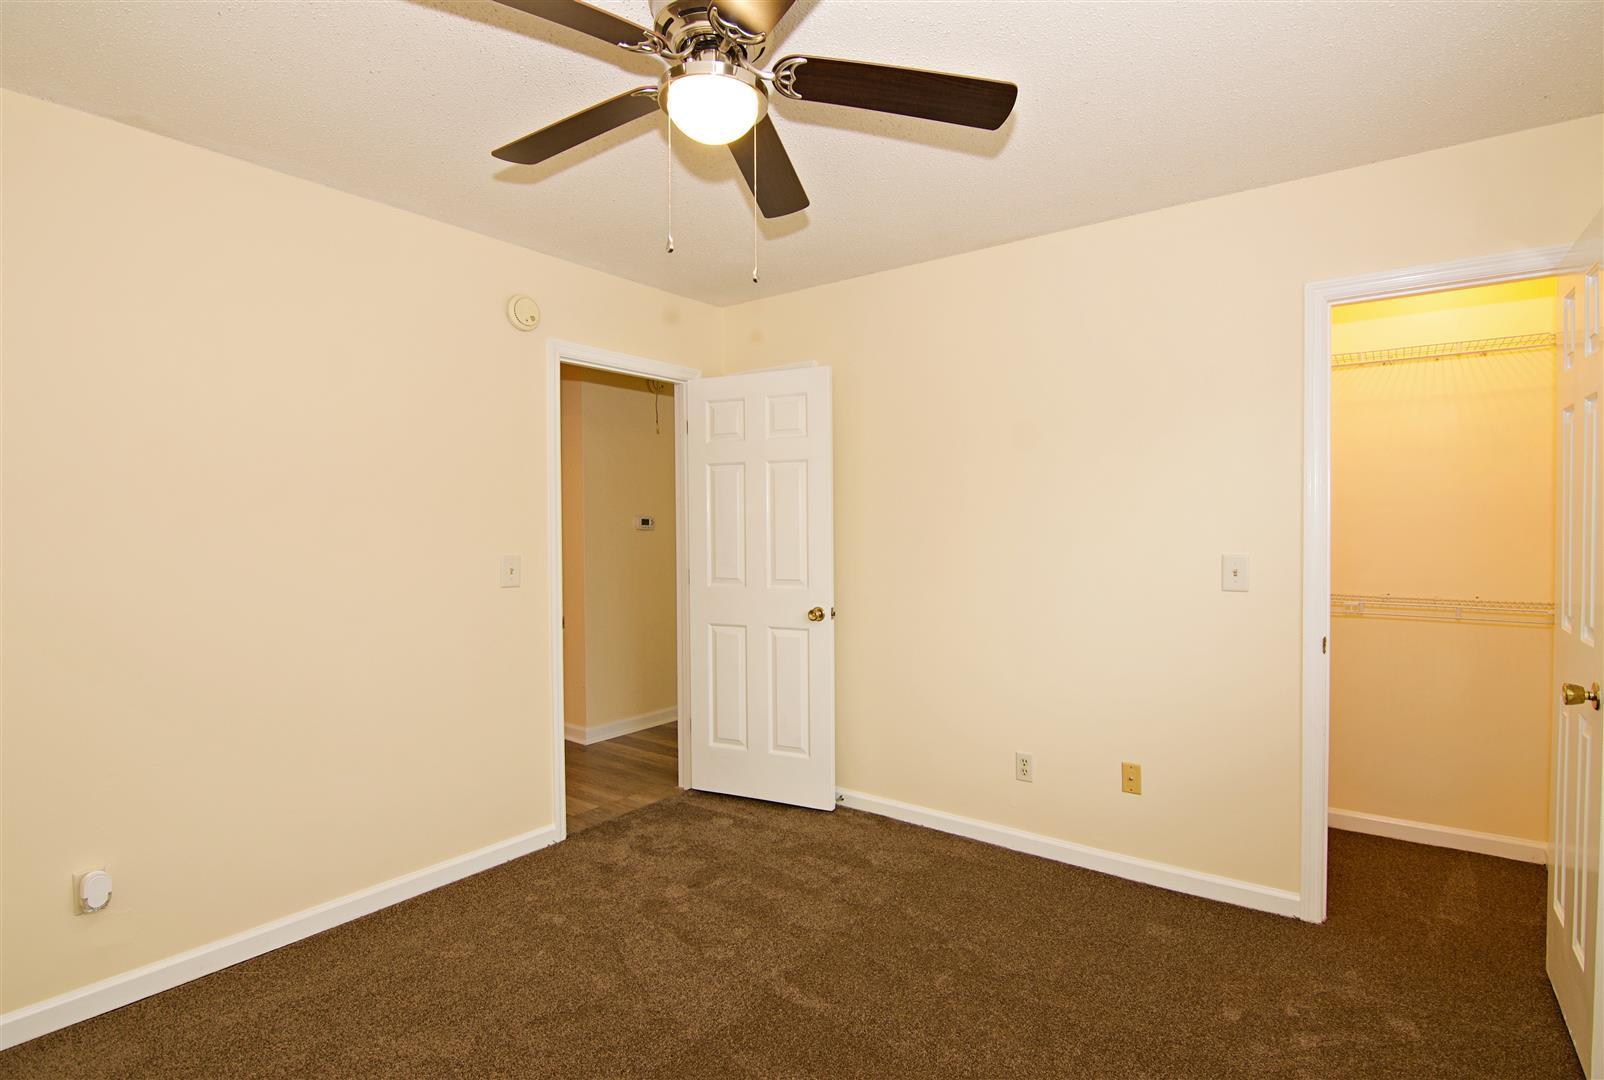 Shaftesbury Woods Homes For Sale - 931 Estates, Charleston, SC - 3